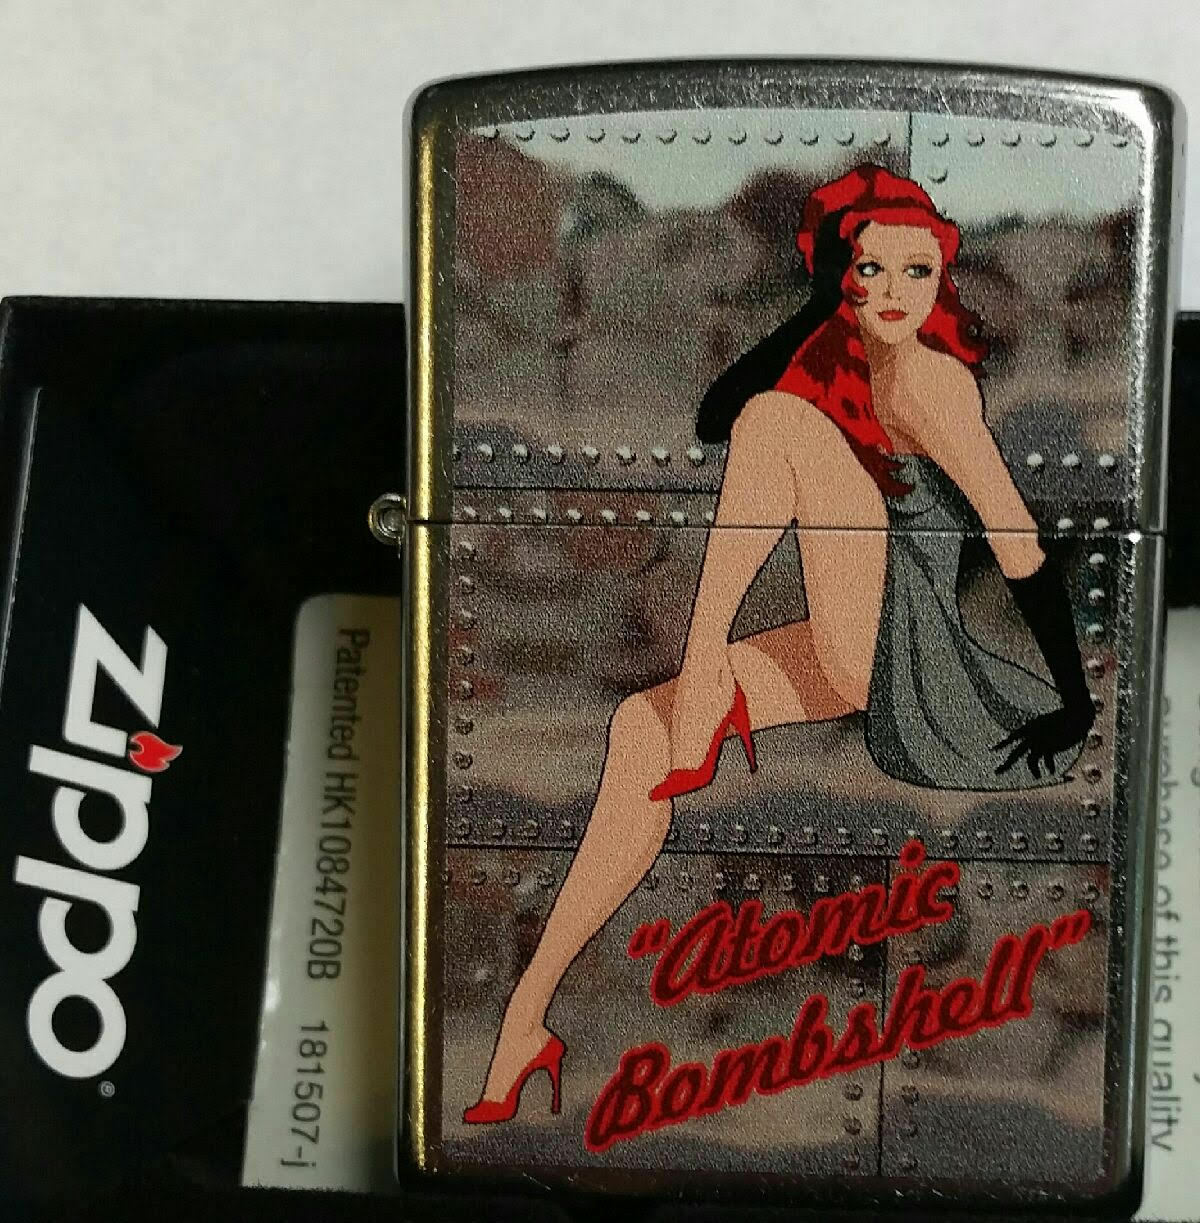 Zippo Lighter Girl Pin Up Atomic Bombshell Redhead New In Bo